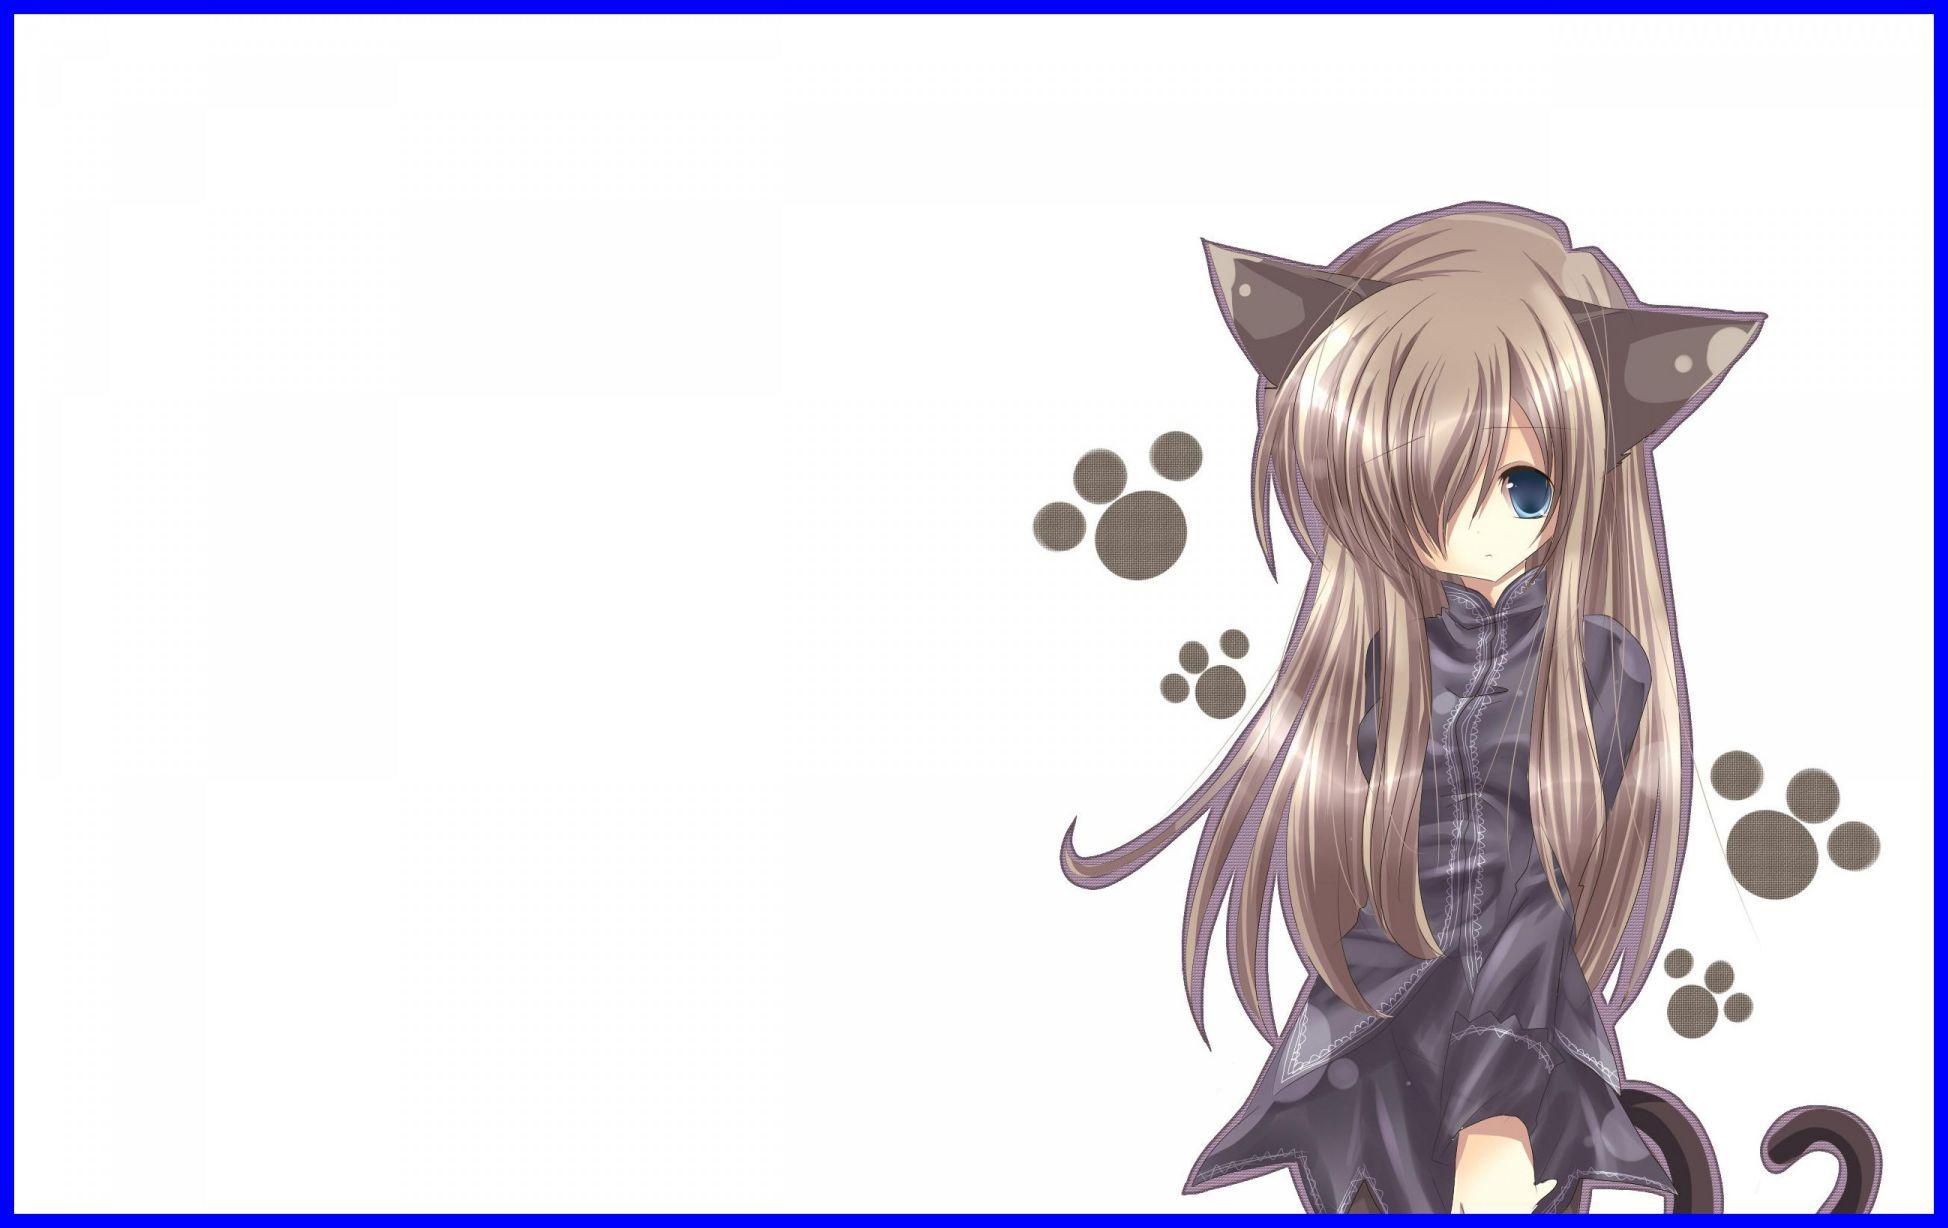 mèo anime chibi